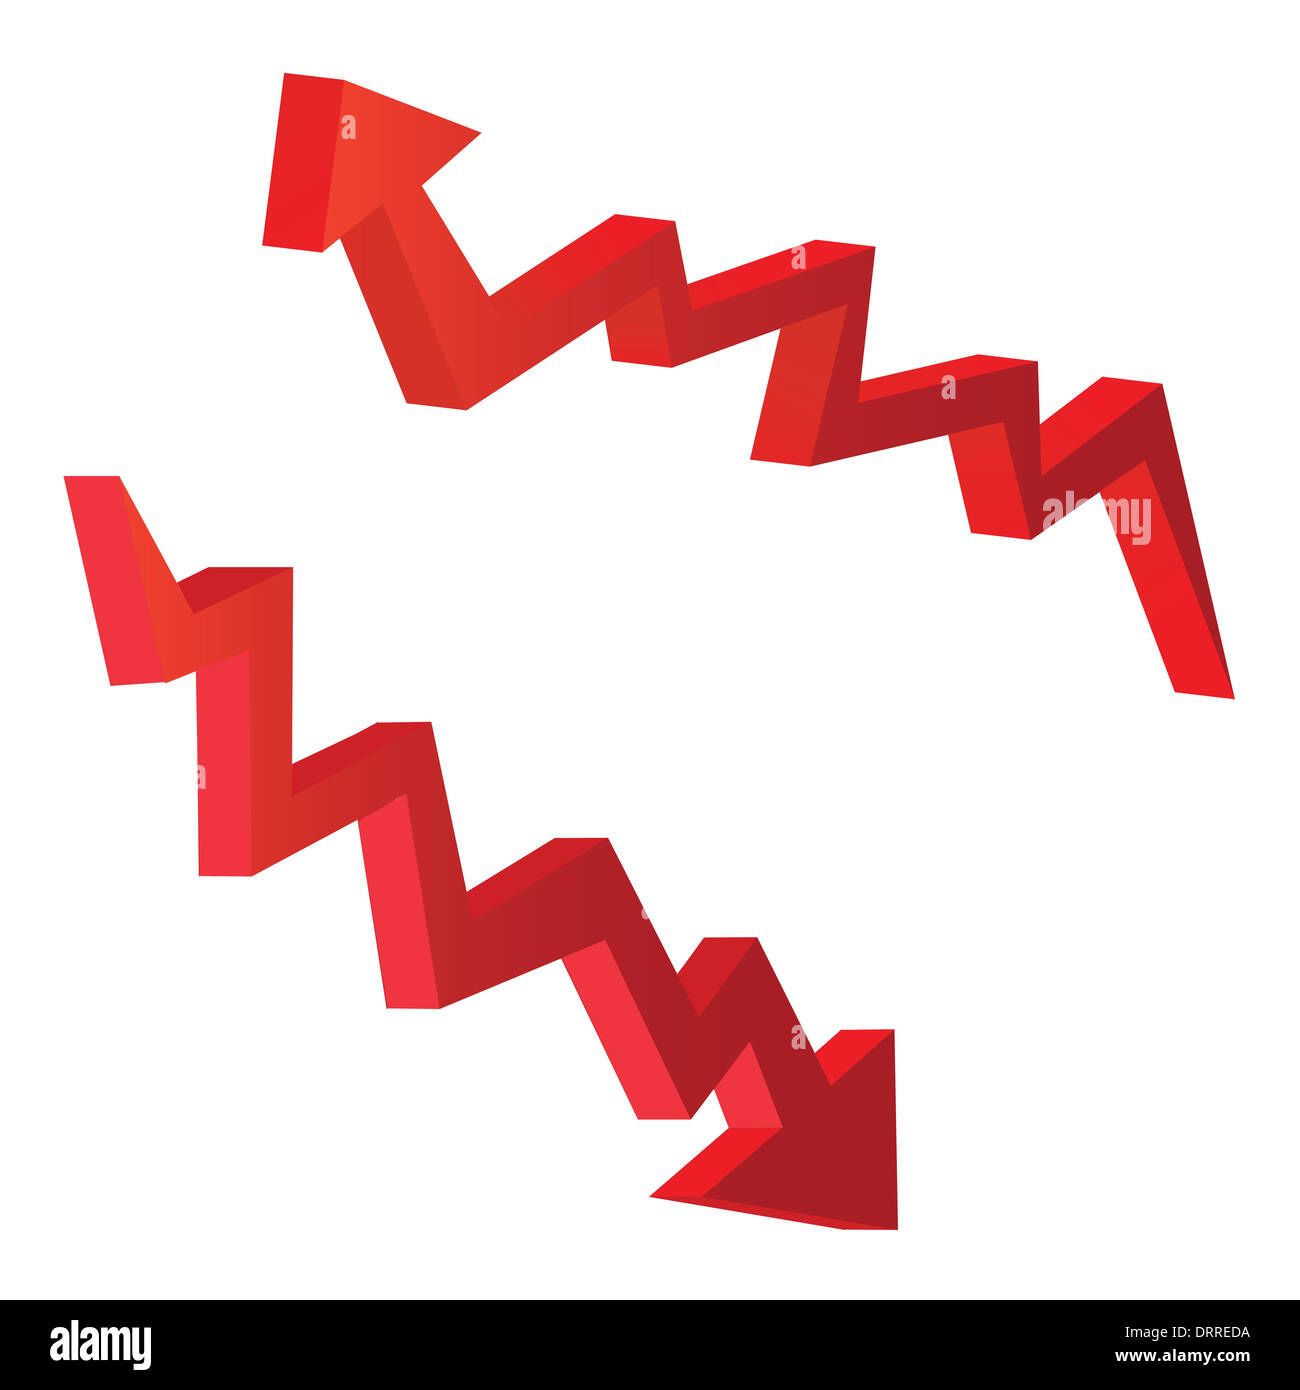 Downward Arrow Stock Photos & Downward Arrow Stock Images - Alamy